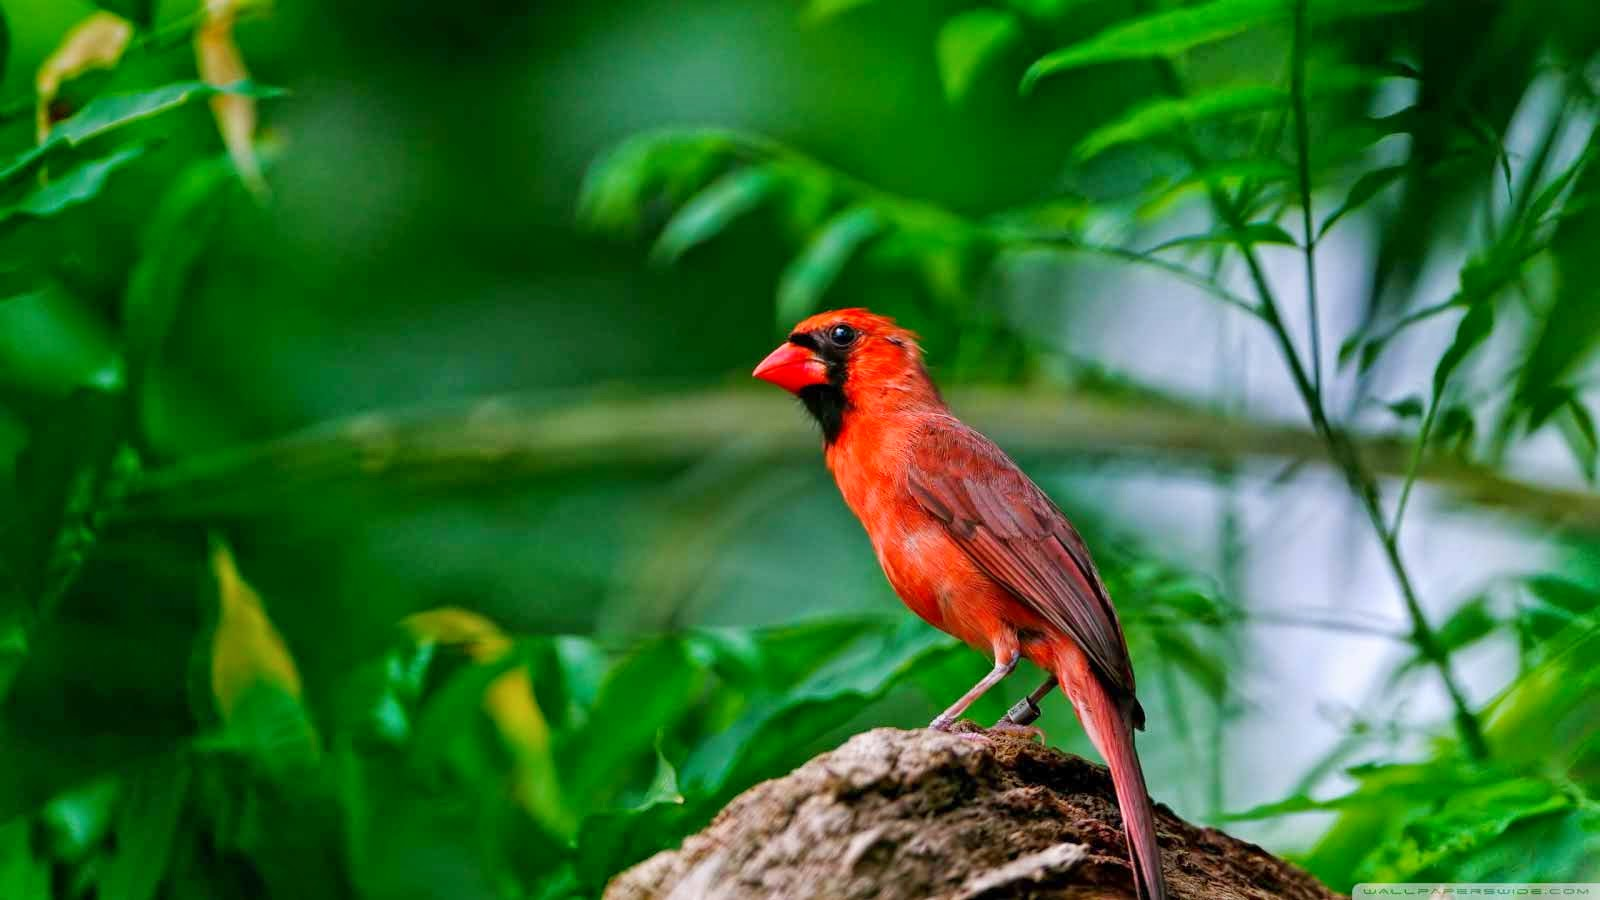 40 free beautiful birds wallpapers hd tinydesignr - Animal and bird hd wallpaper ...